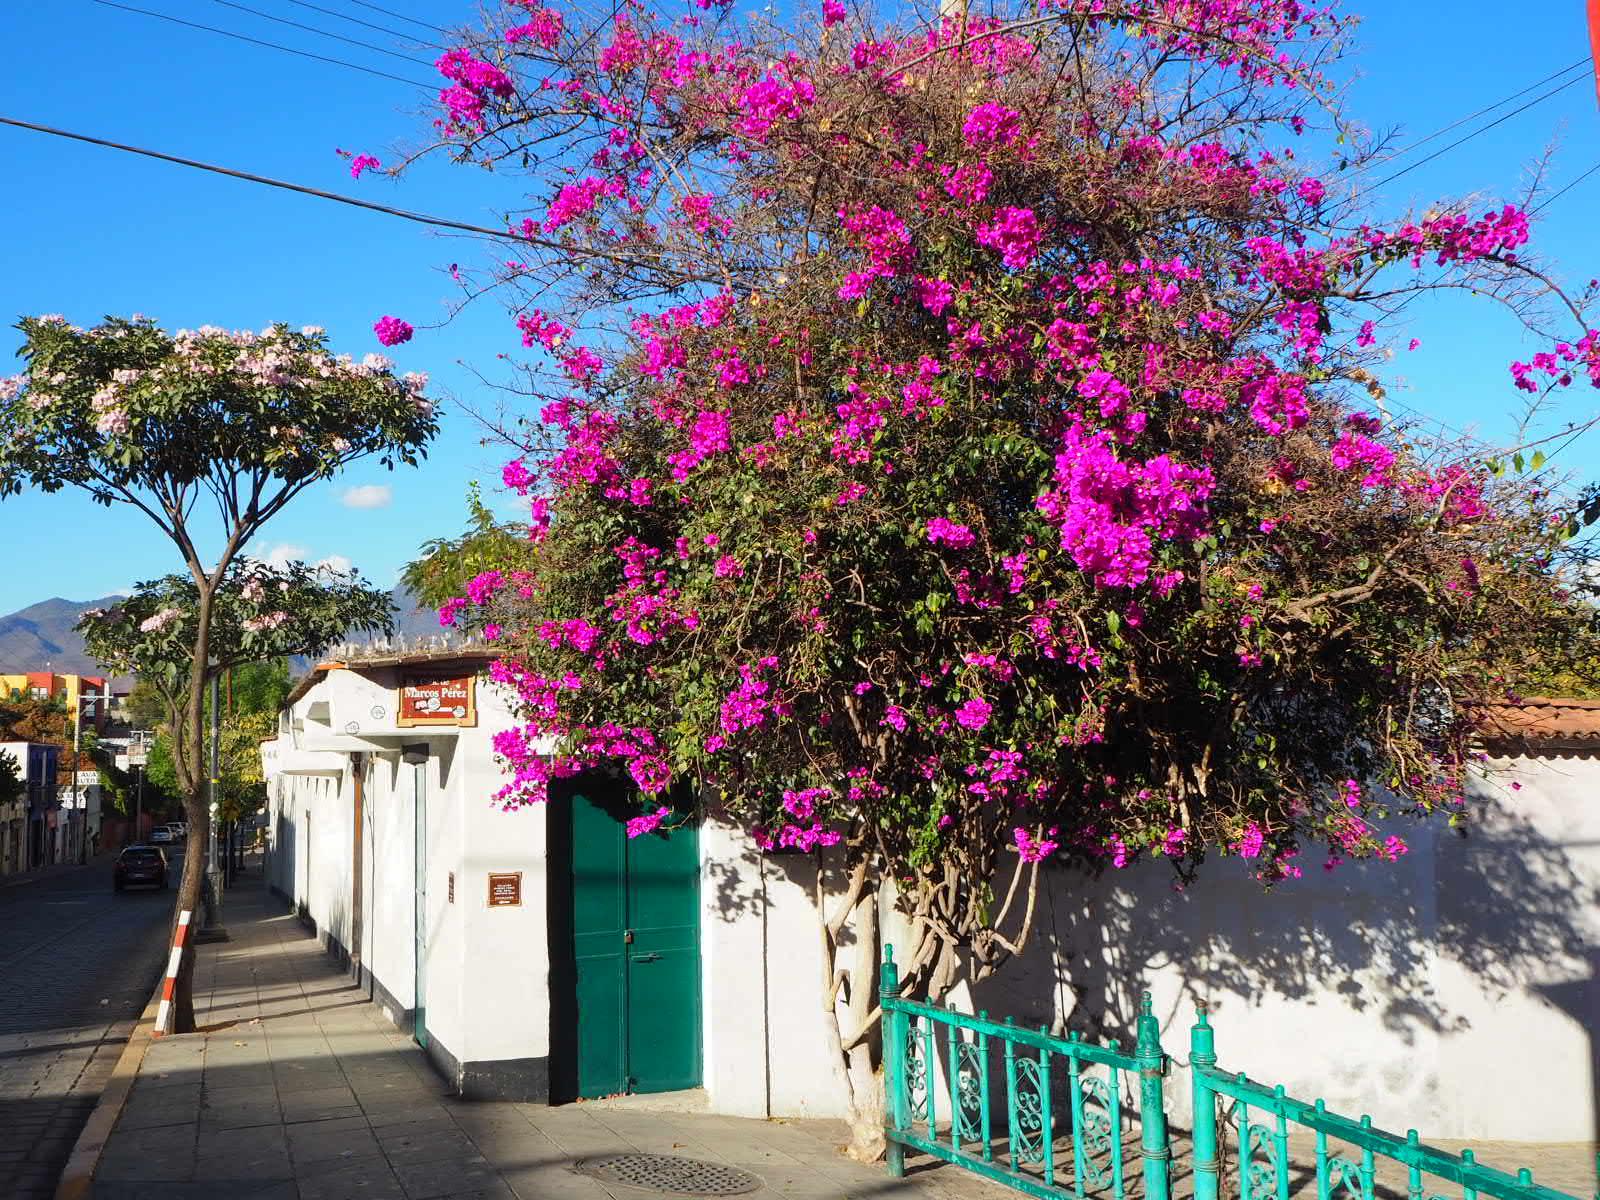 Working in Oaxaca Image Relay